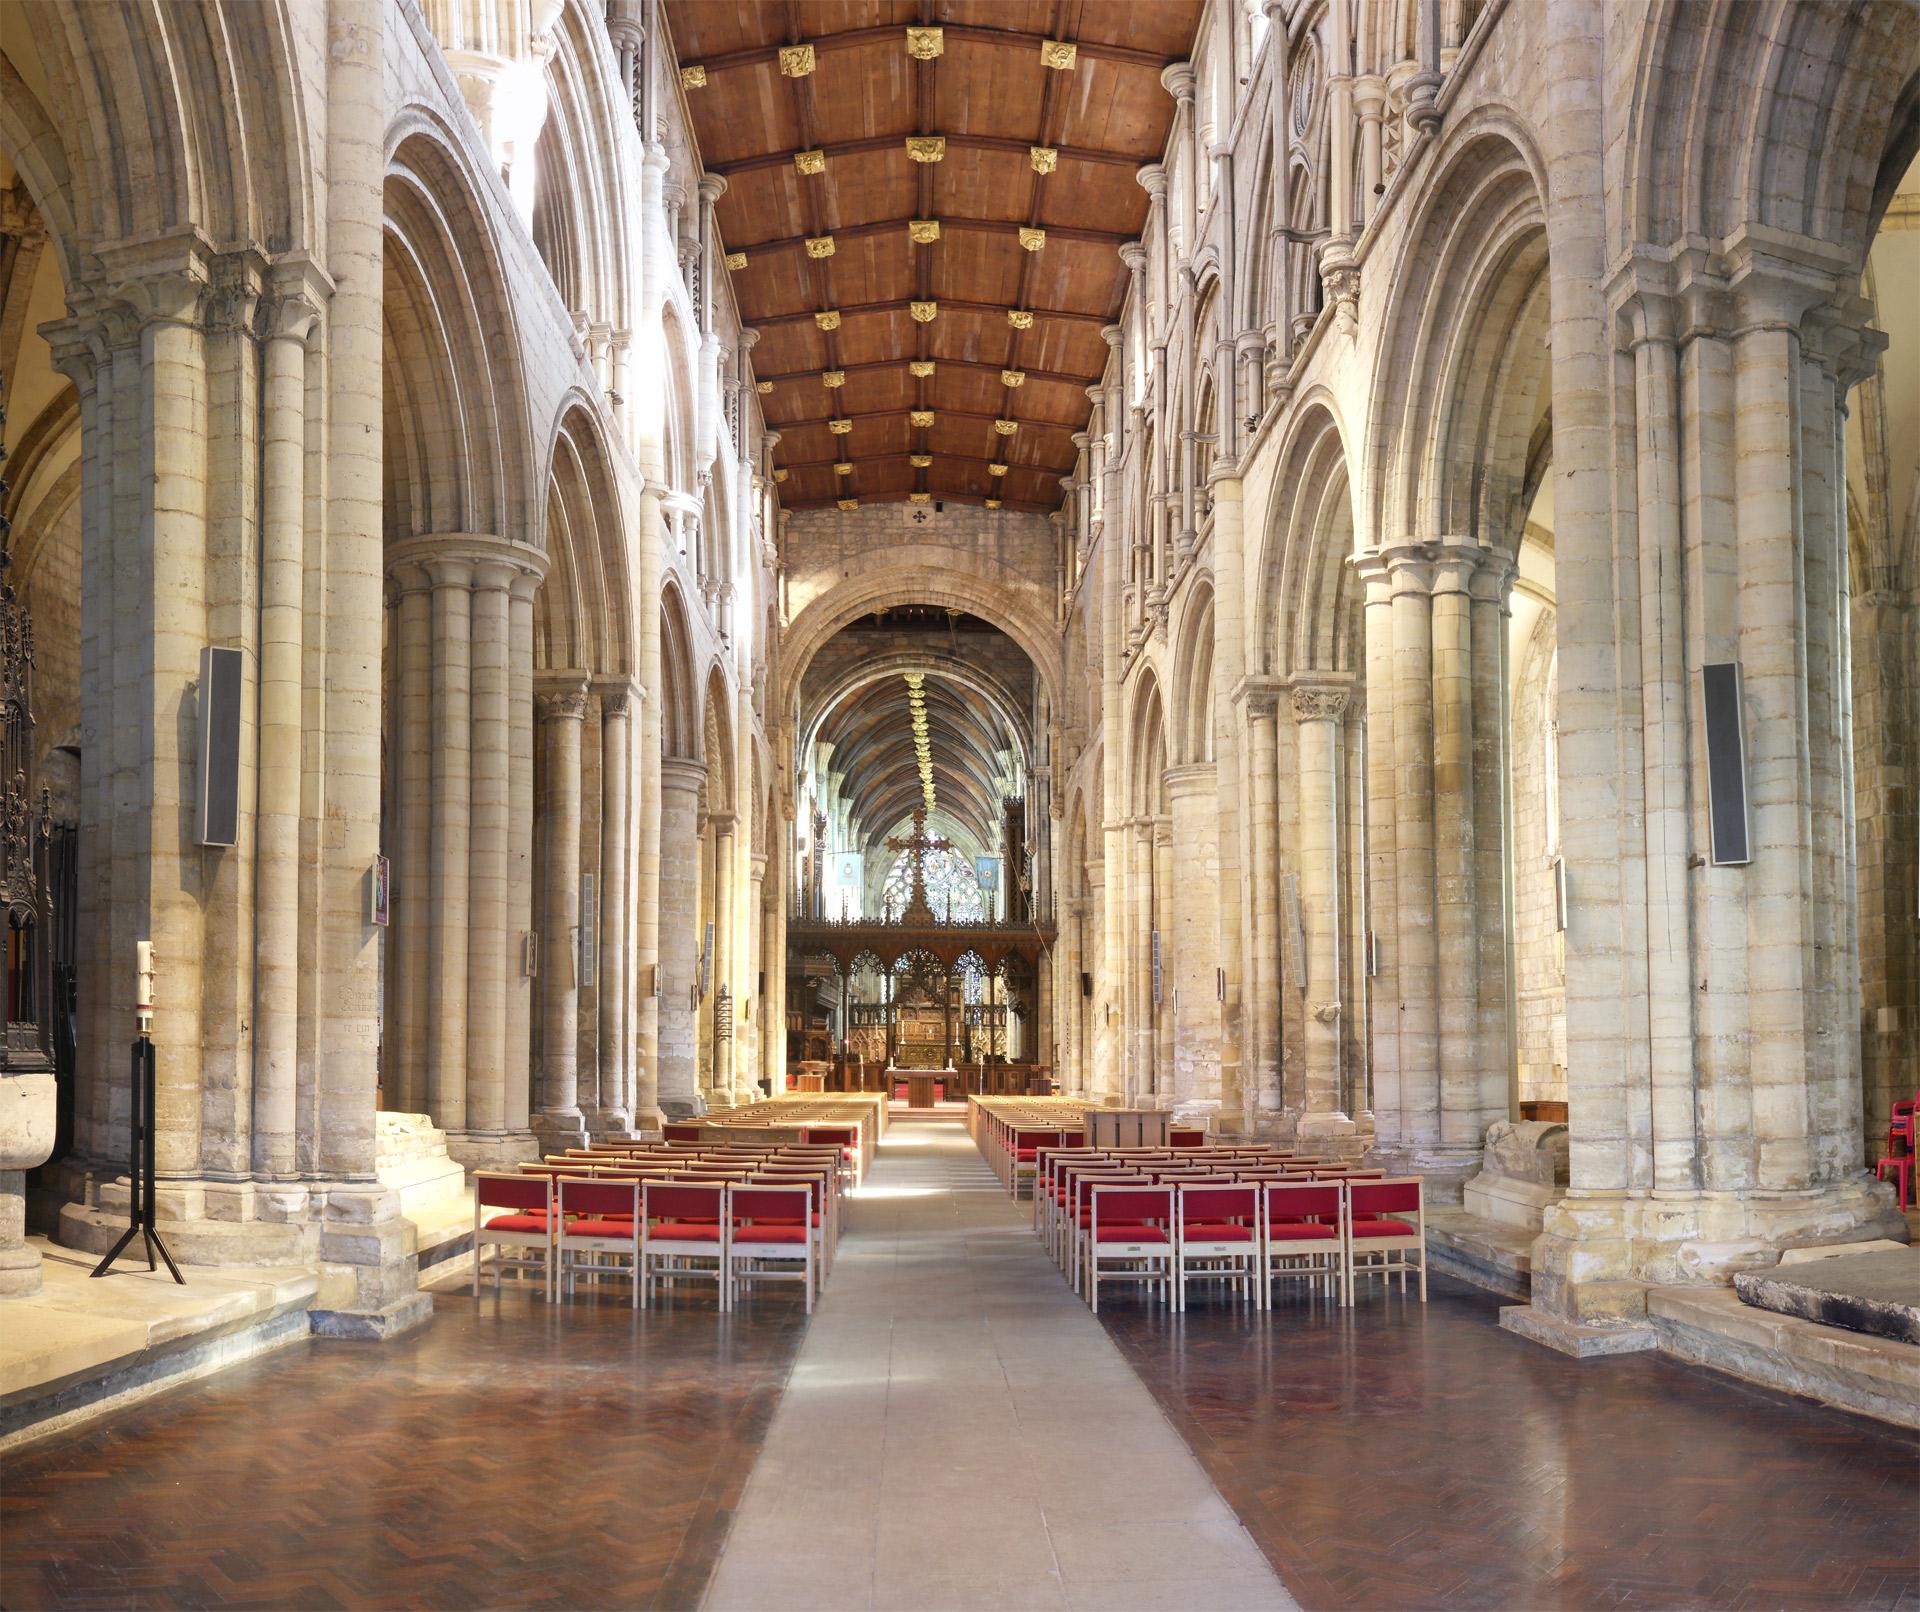 Selby Abbey interior 3.jpg